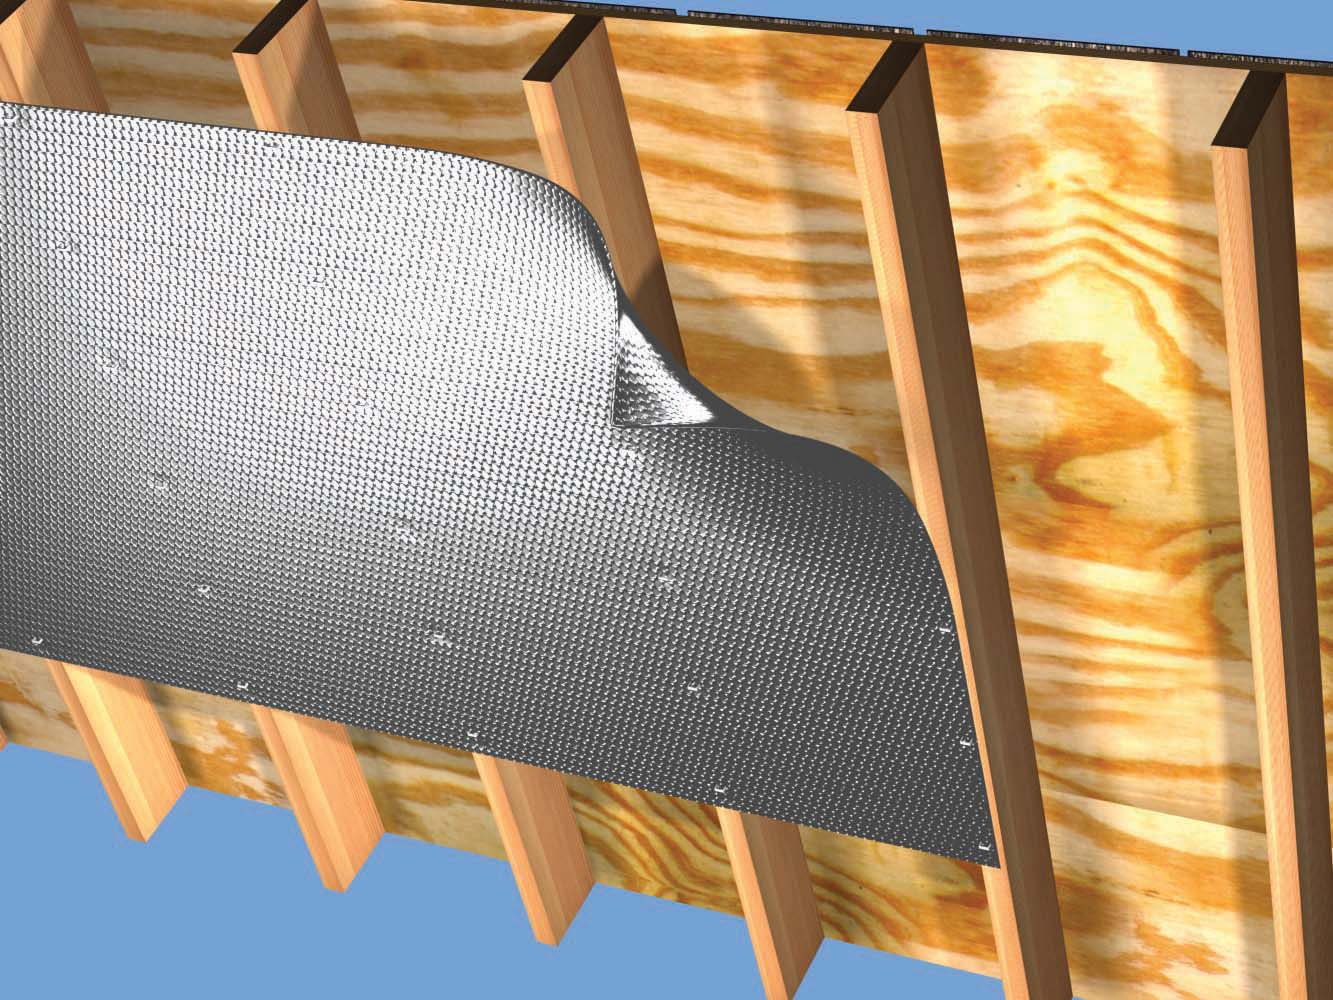 Folie termoizolanta utlilizare - Acoperisuri, poduri si mansarde REFLECTIX - Poza 1